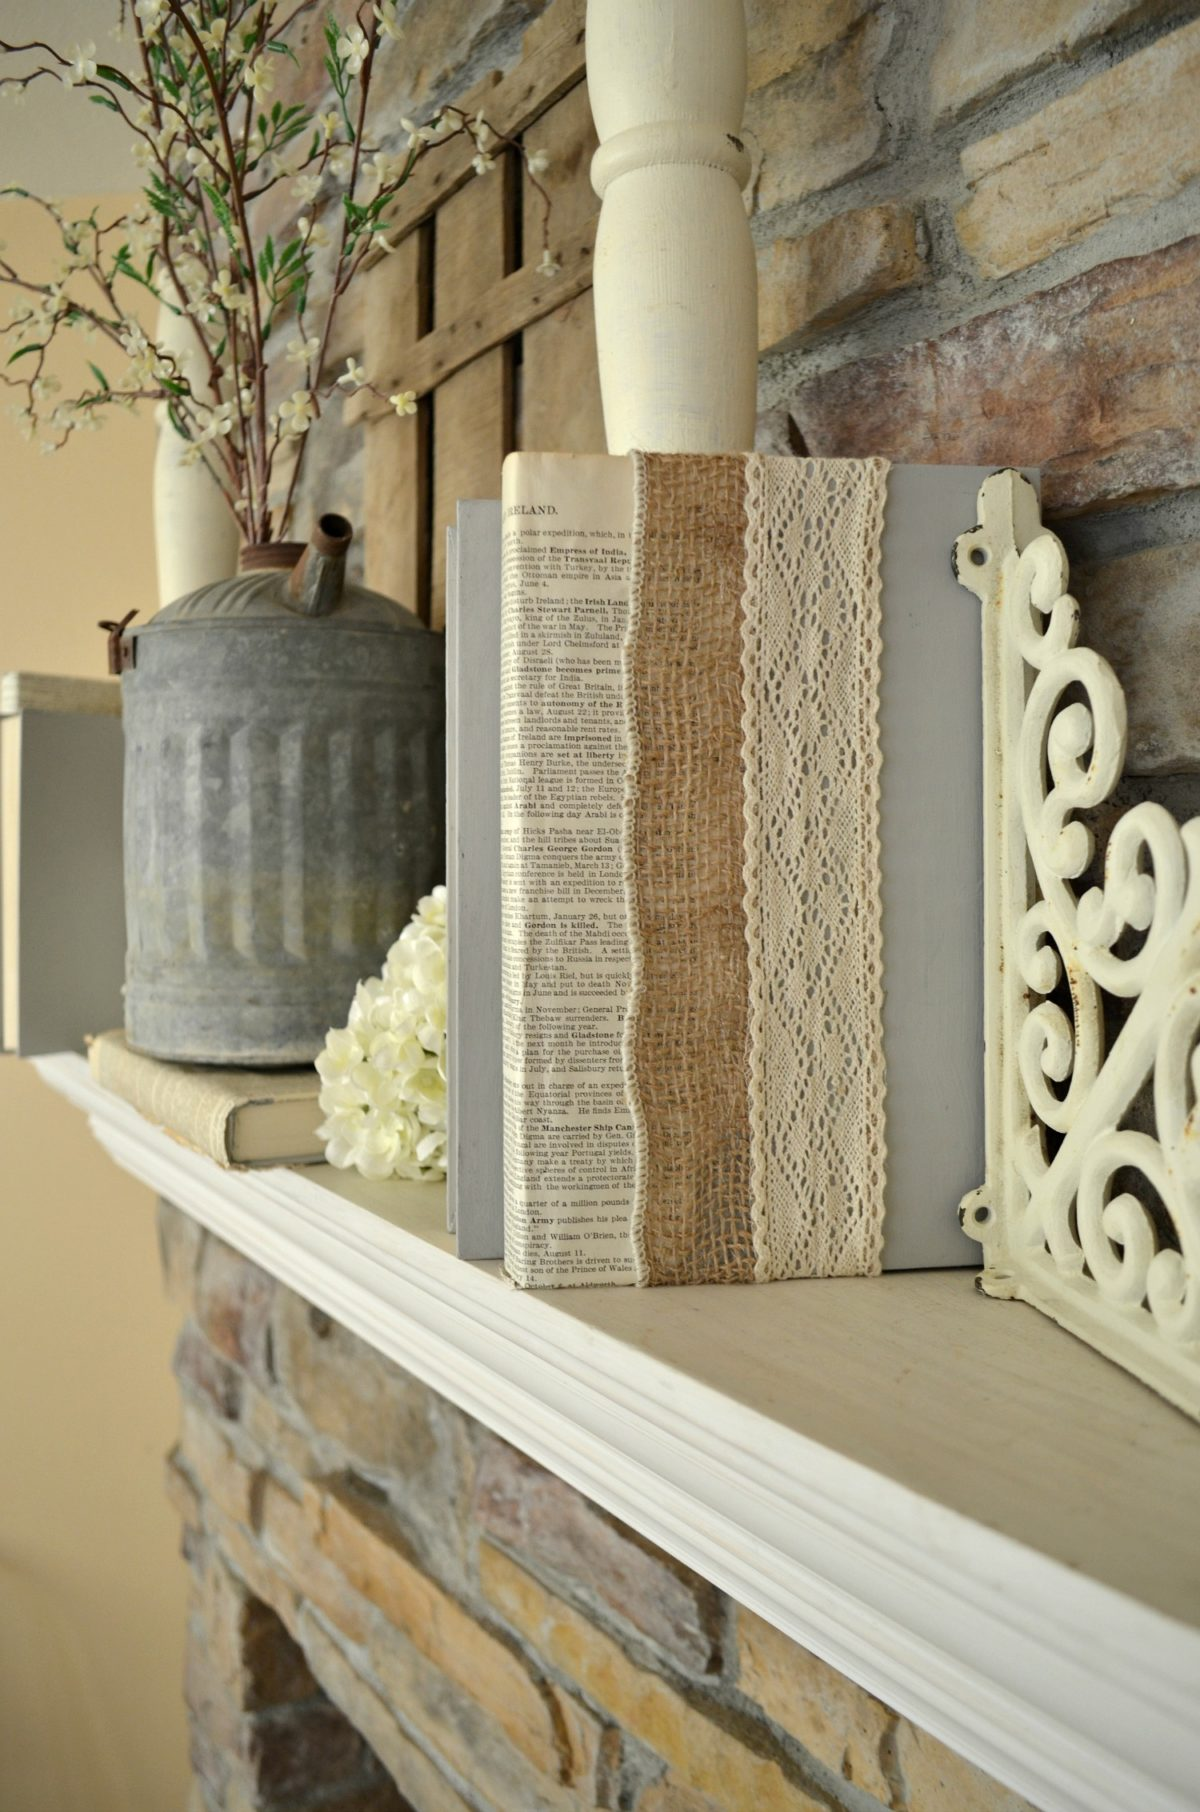 Diy Lace Book Cover ~ Diy lace burlap covered books little vintage nest